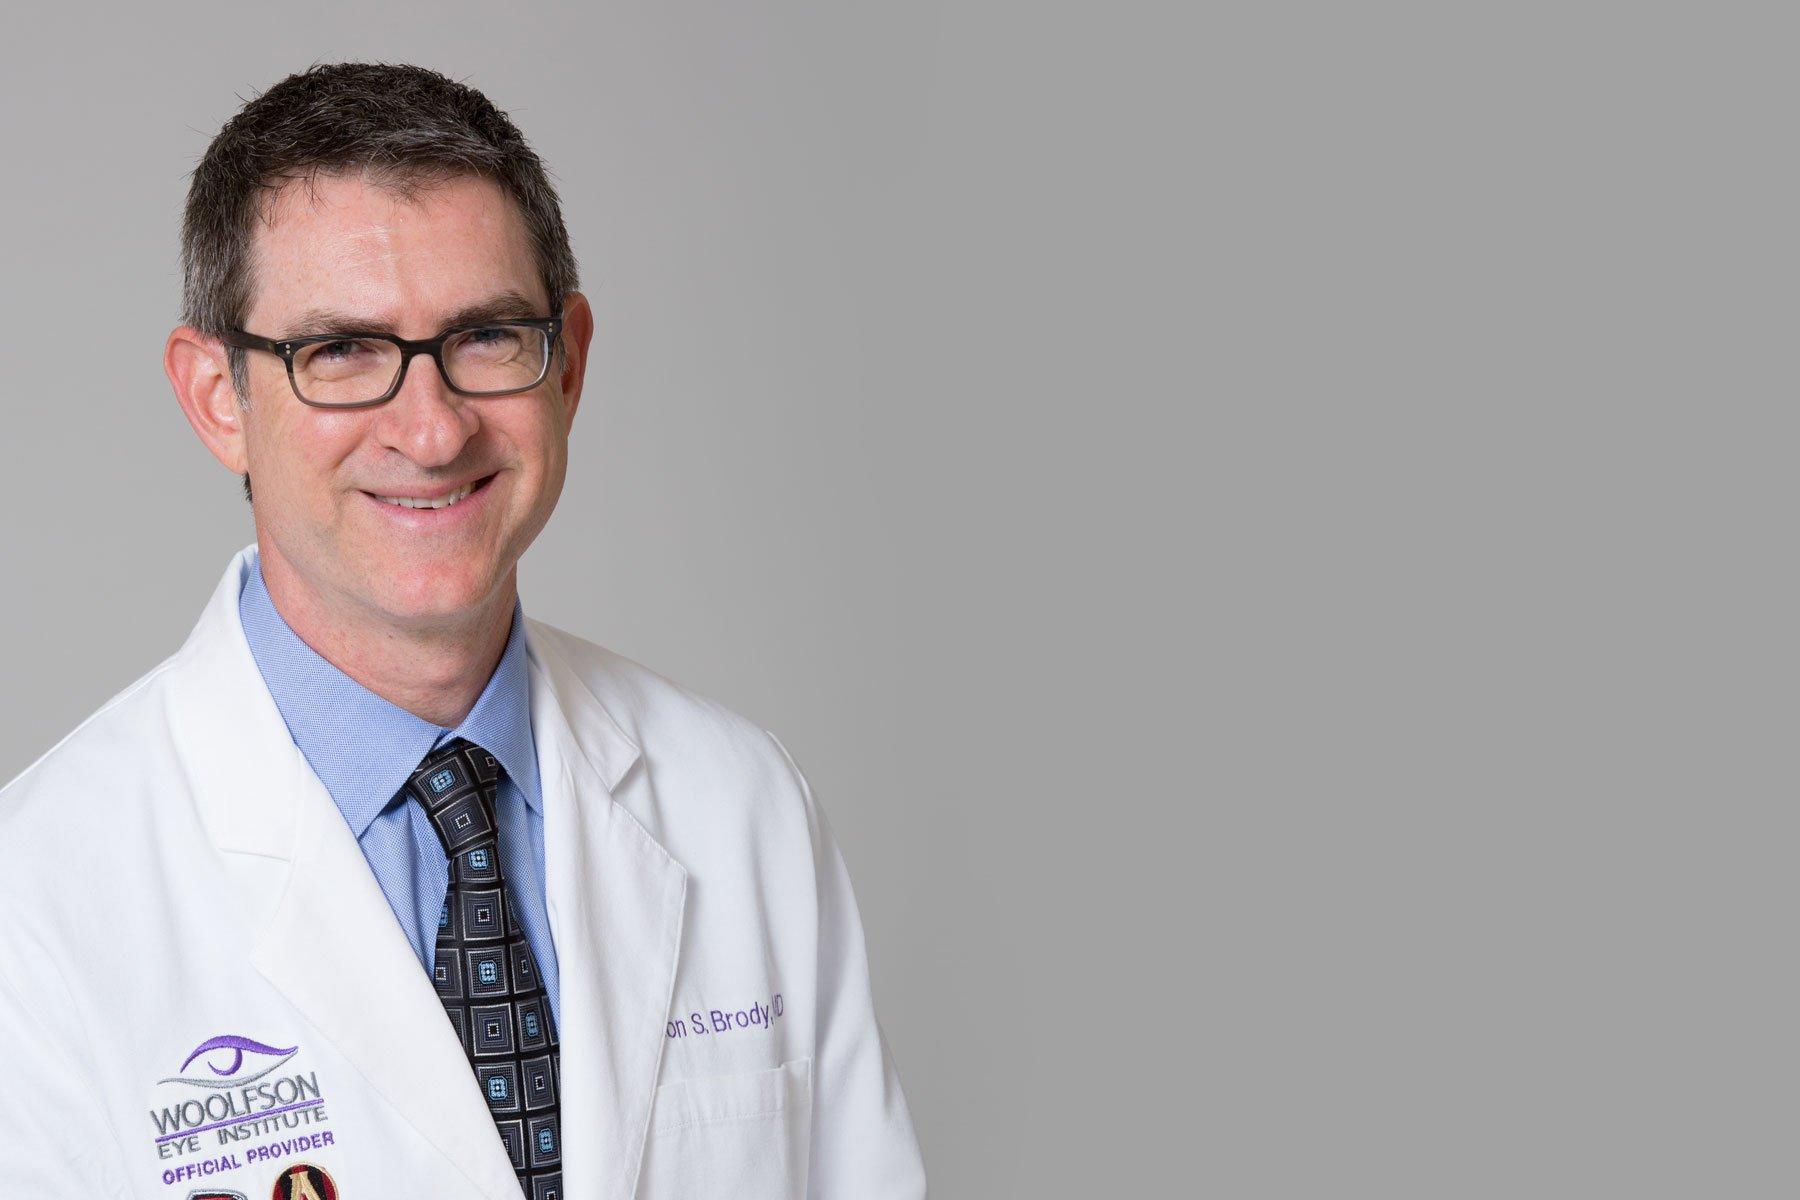 Jason S. Brody, MD